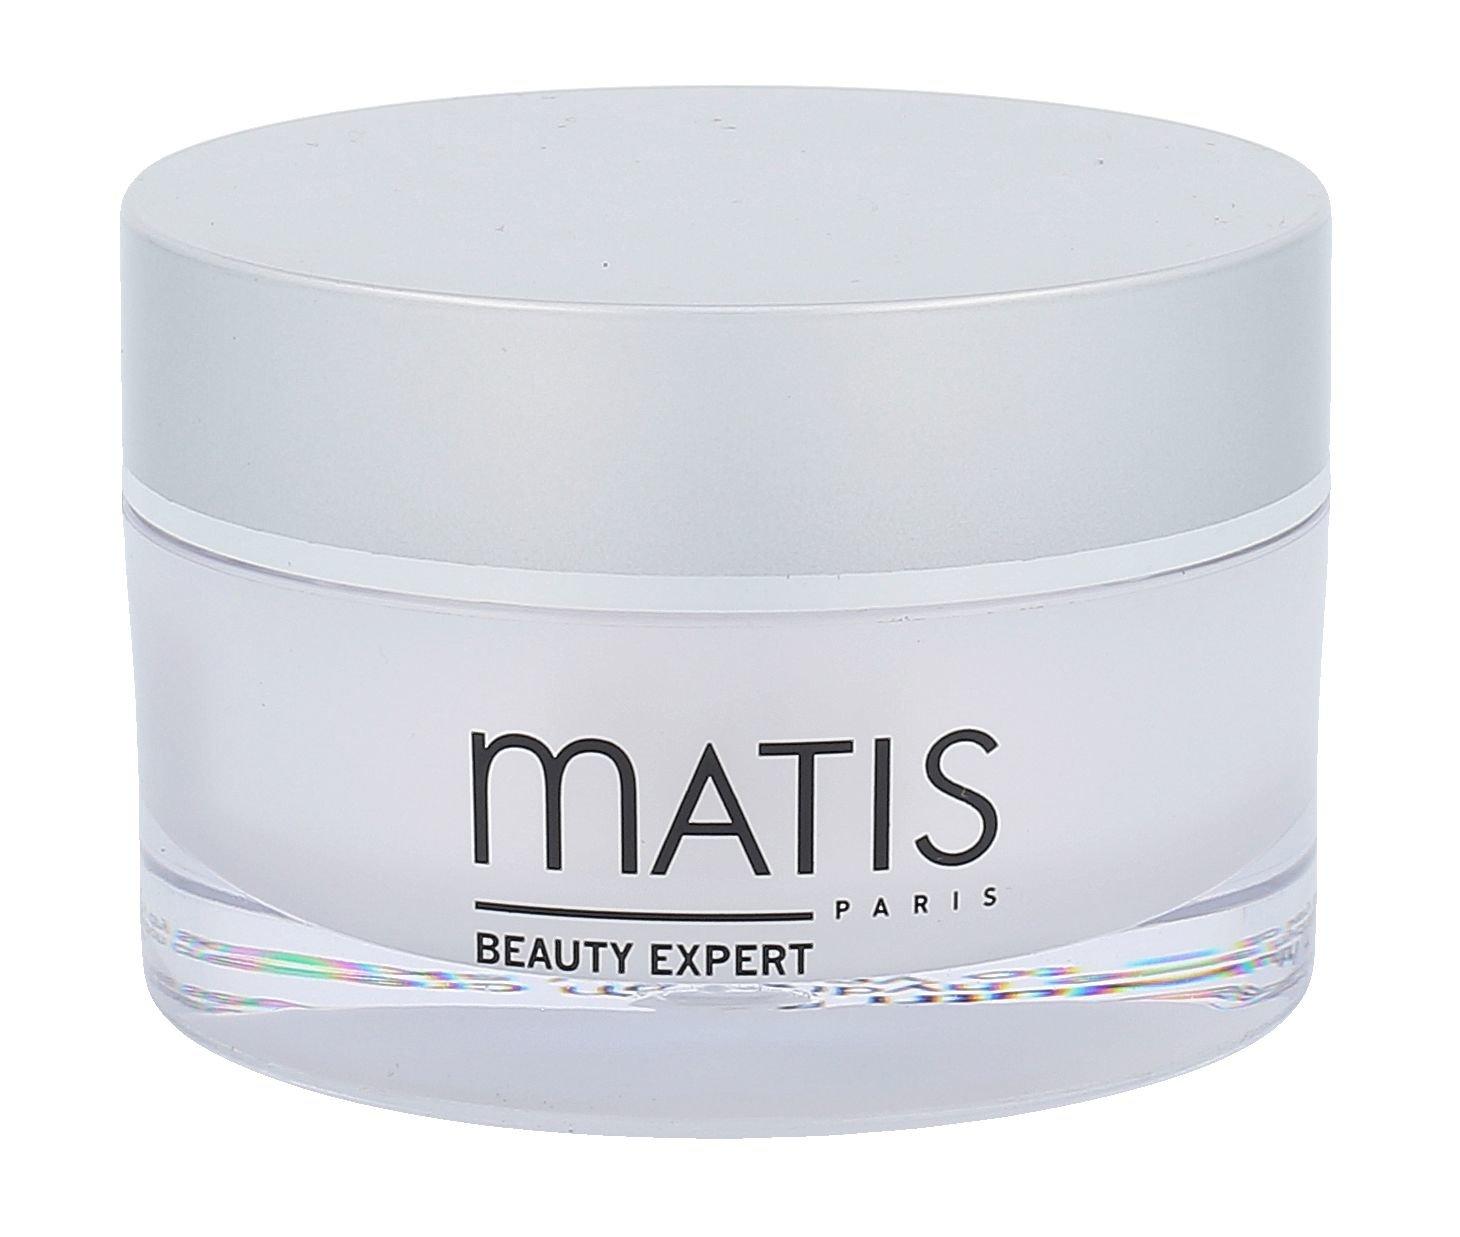 Matis Réponse Corps Beauté Cosmetic 50ml  SOS Nutri +